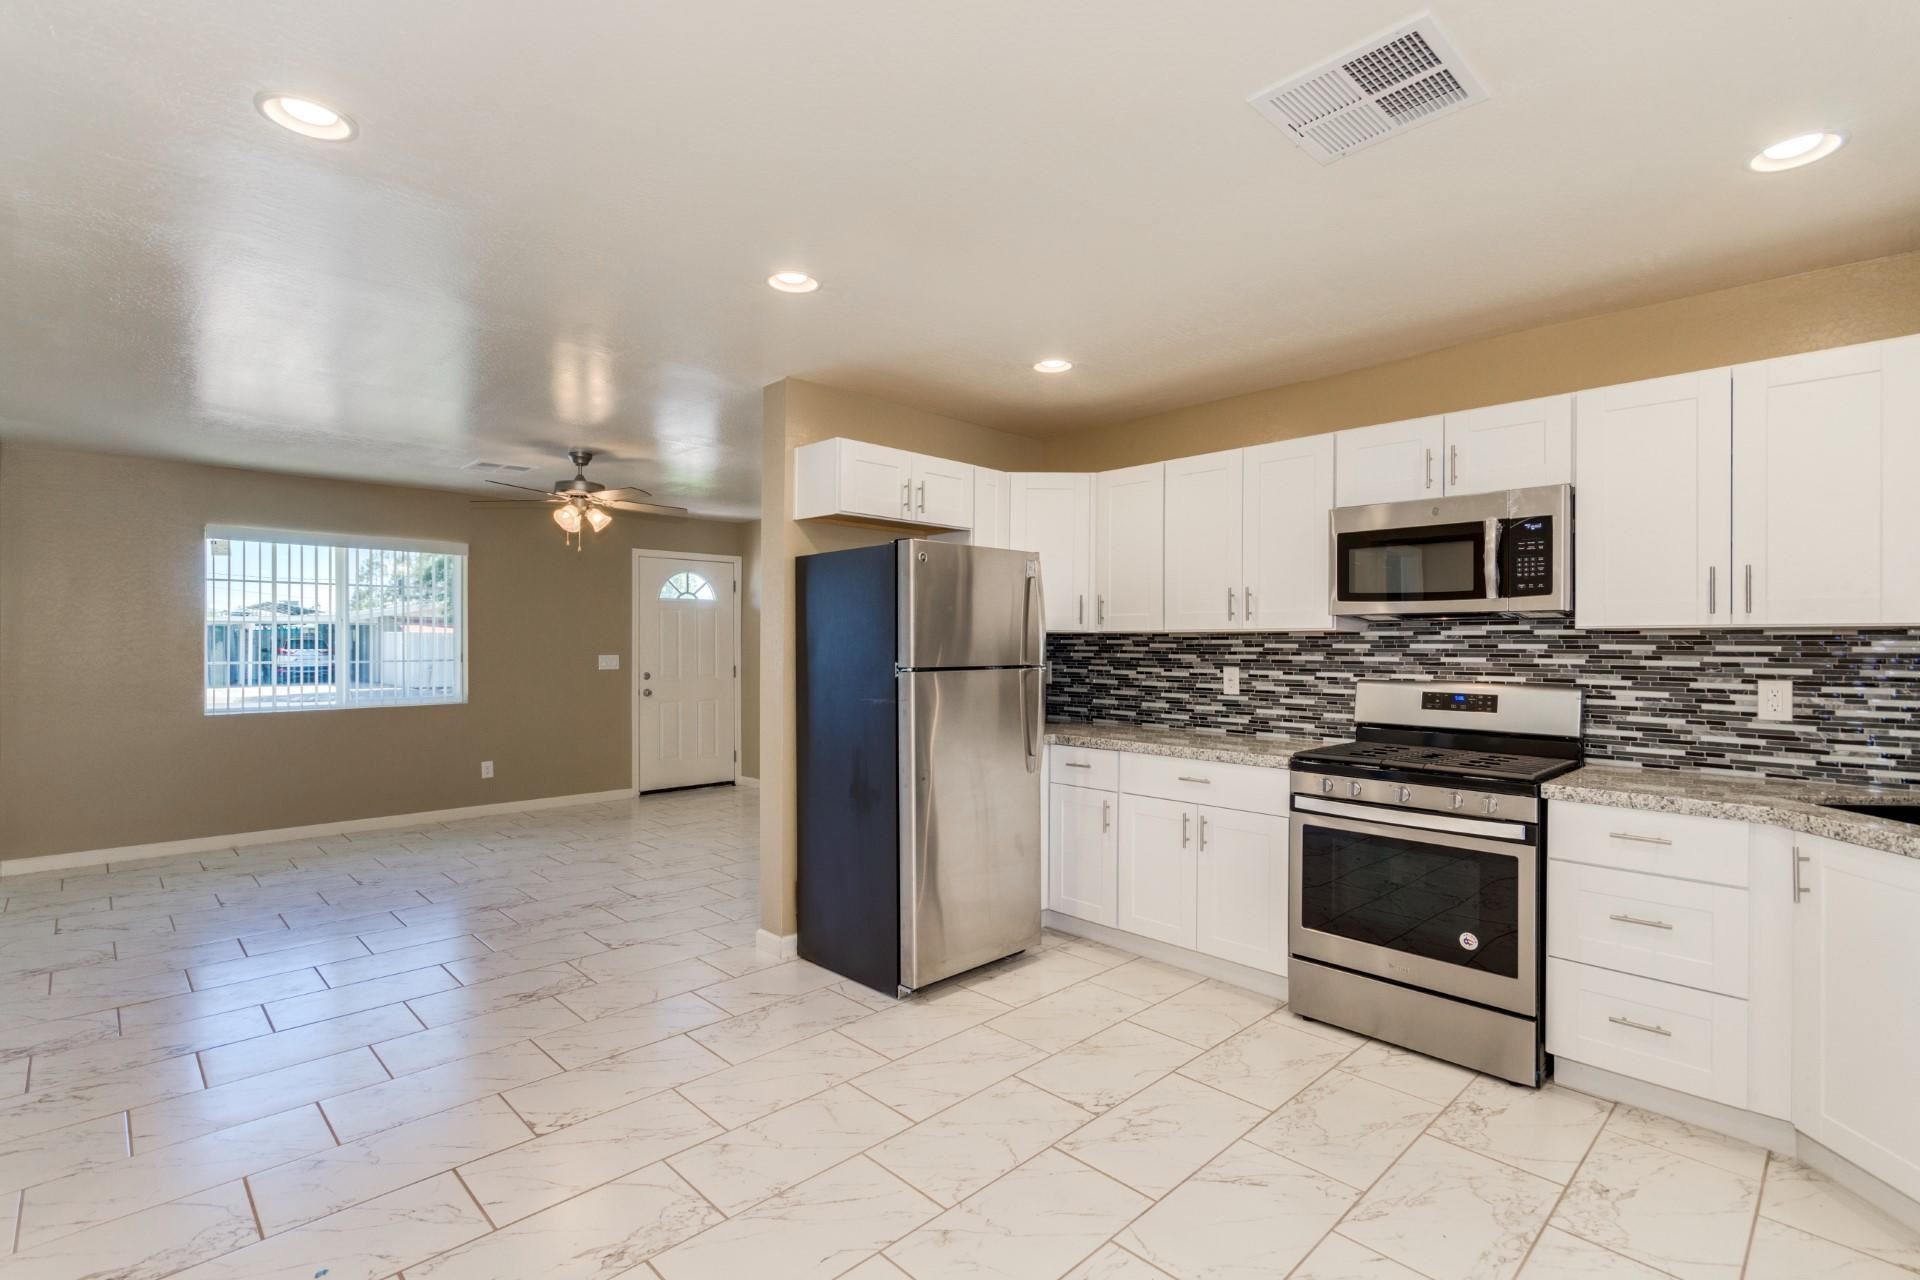 3848 N 23RD Avenue, Phoenix, AZ 85015 - MLS#: 6237343